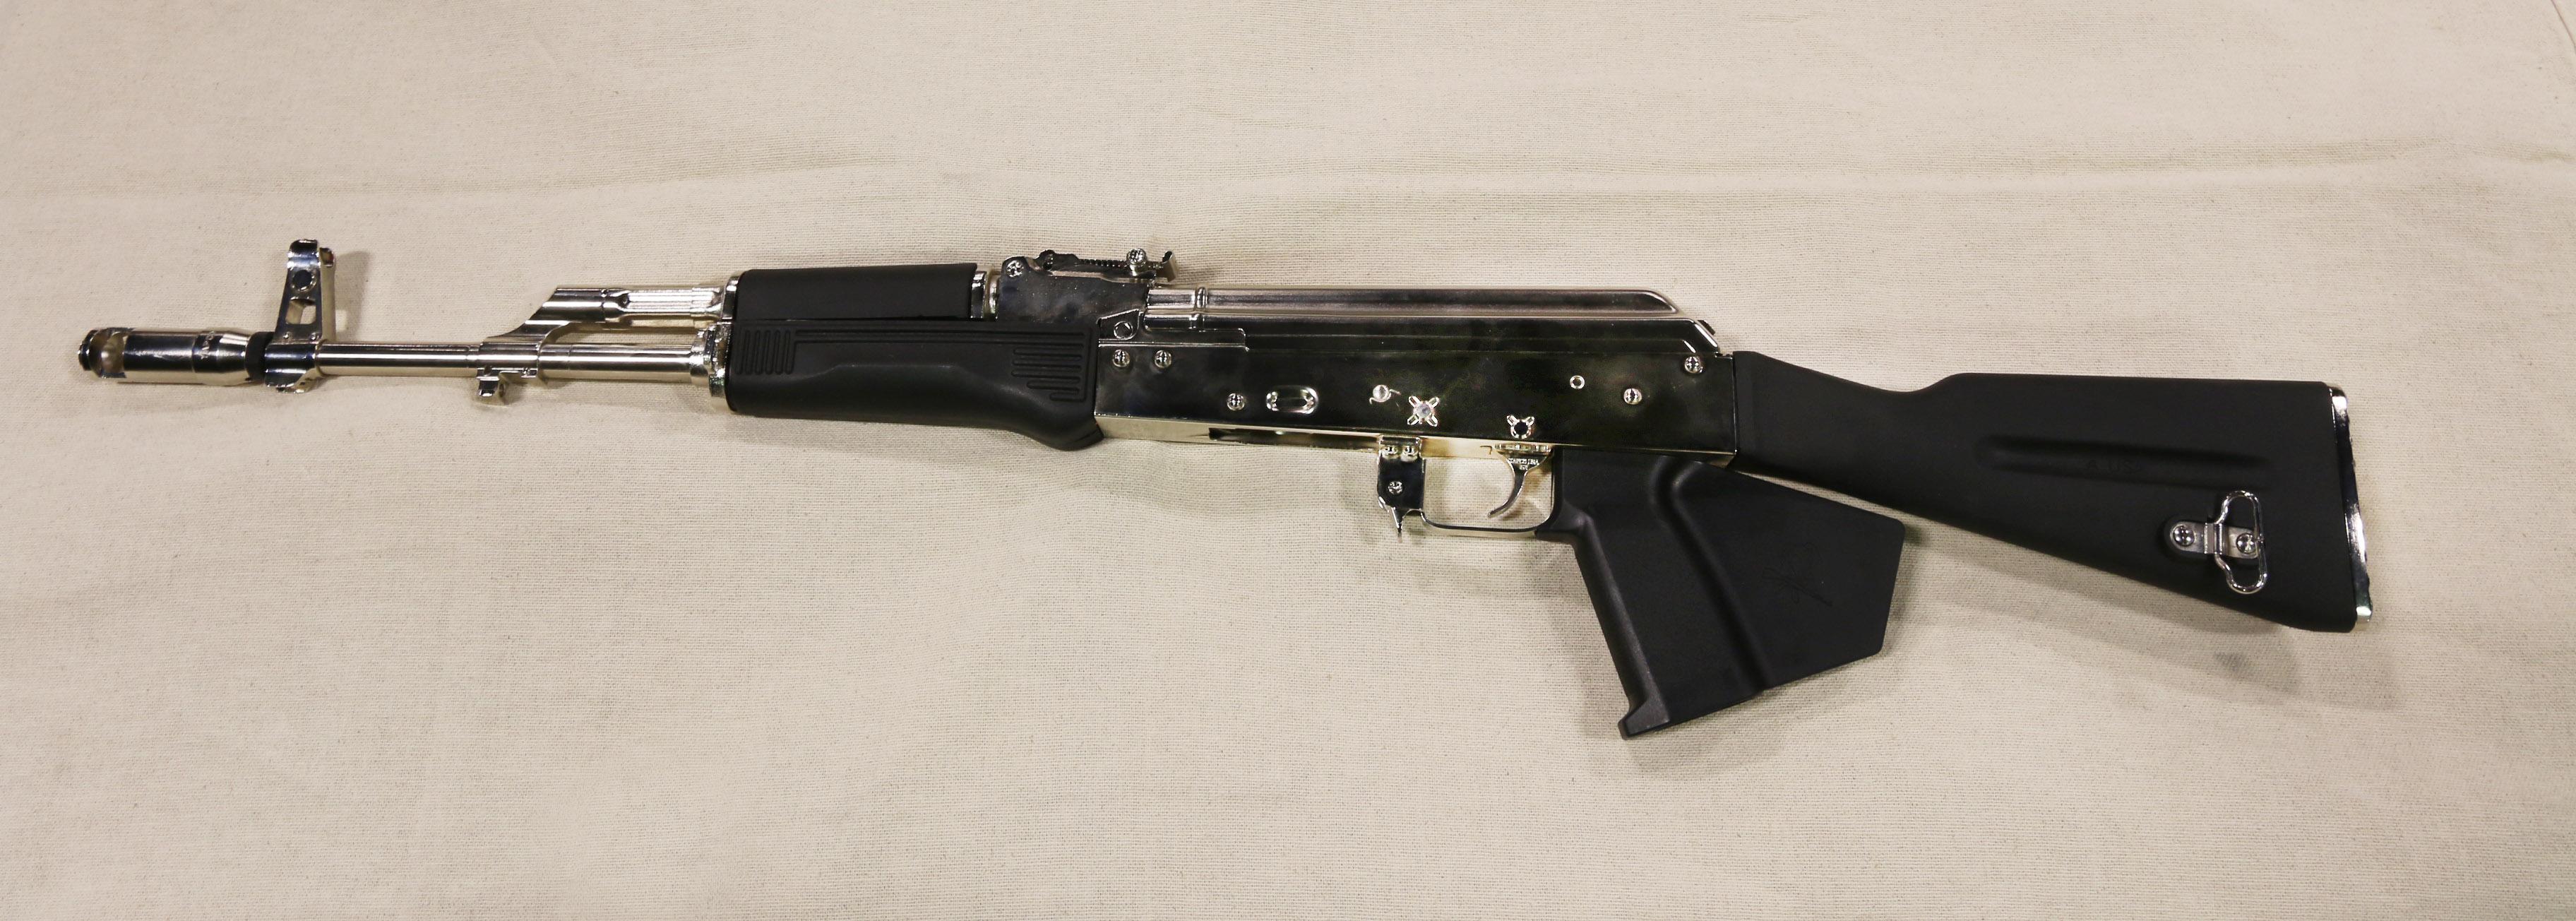 GreatDane AK Armory, AK Manufacturer California  CA,NY,NJ